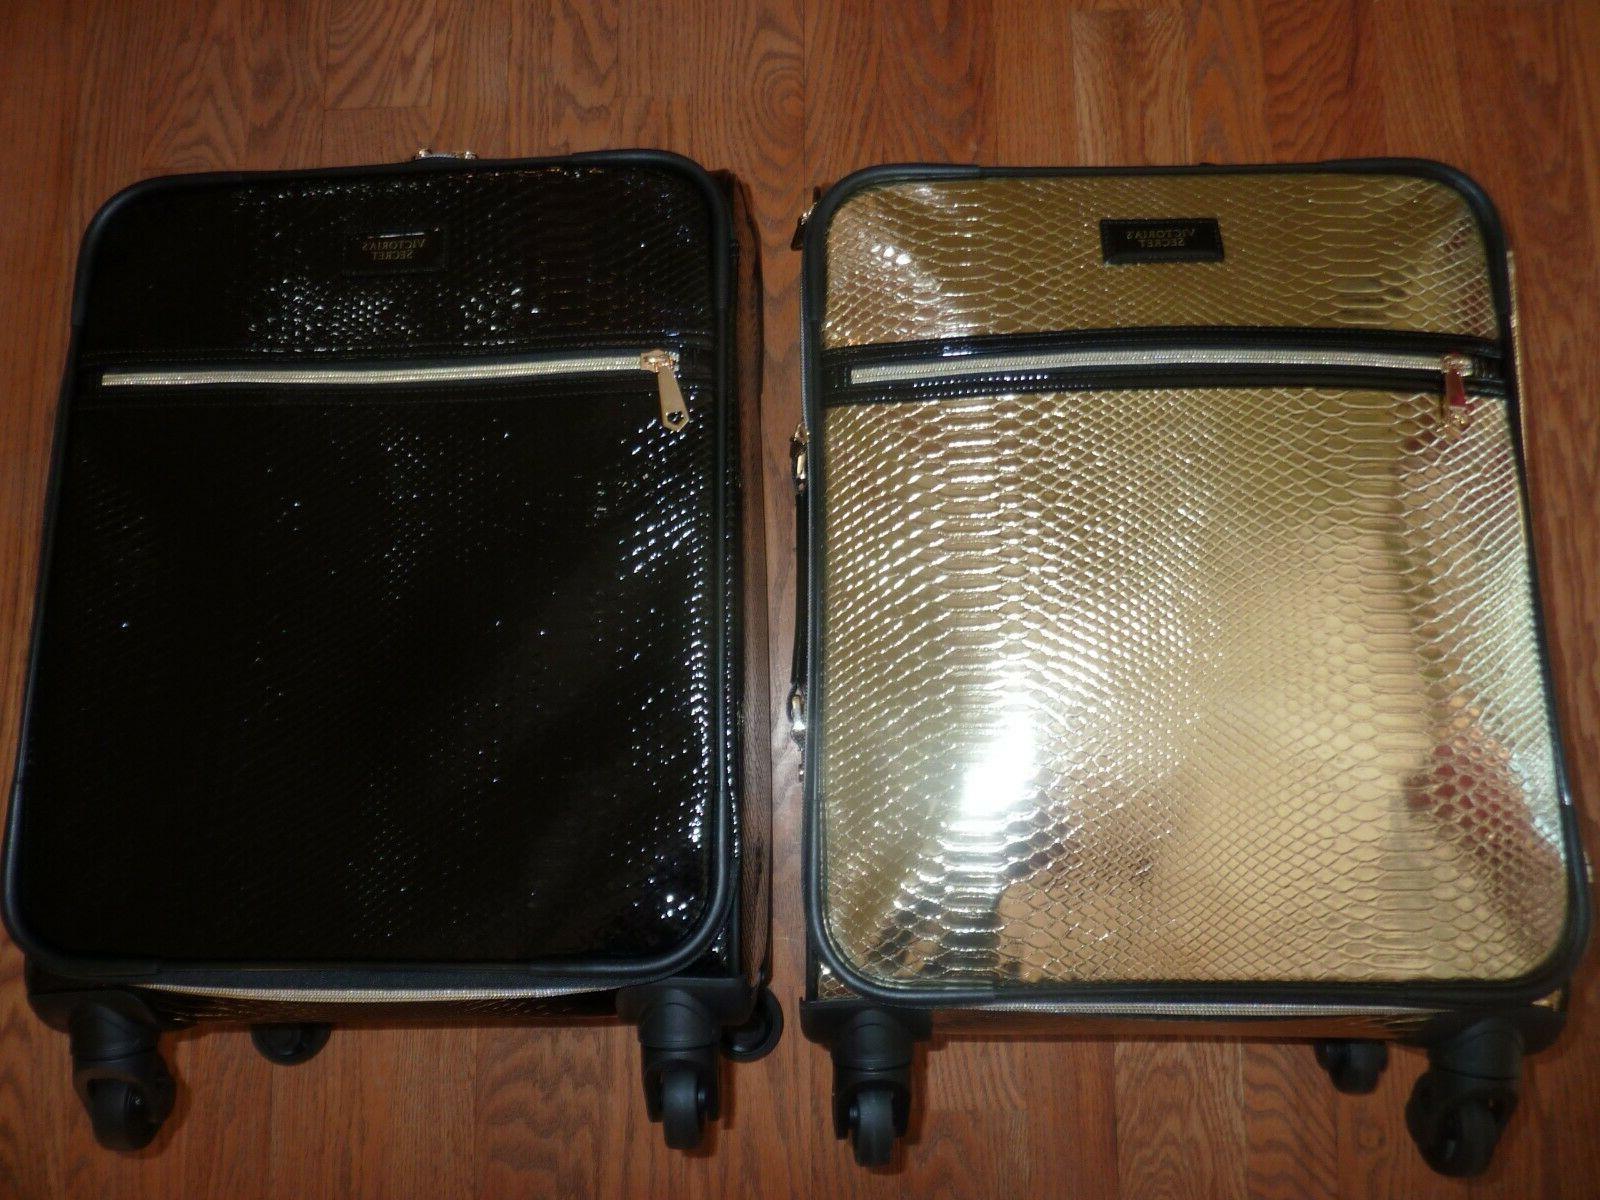 victorias secret supermodel python luggage wheelie suitcase